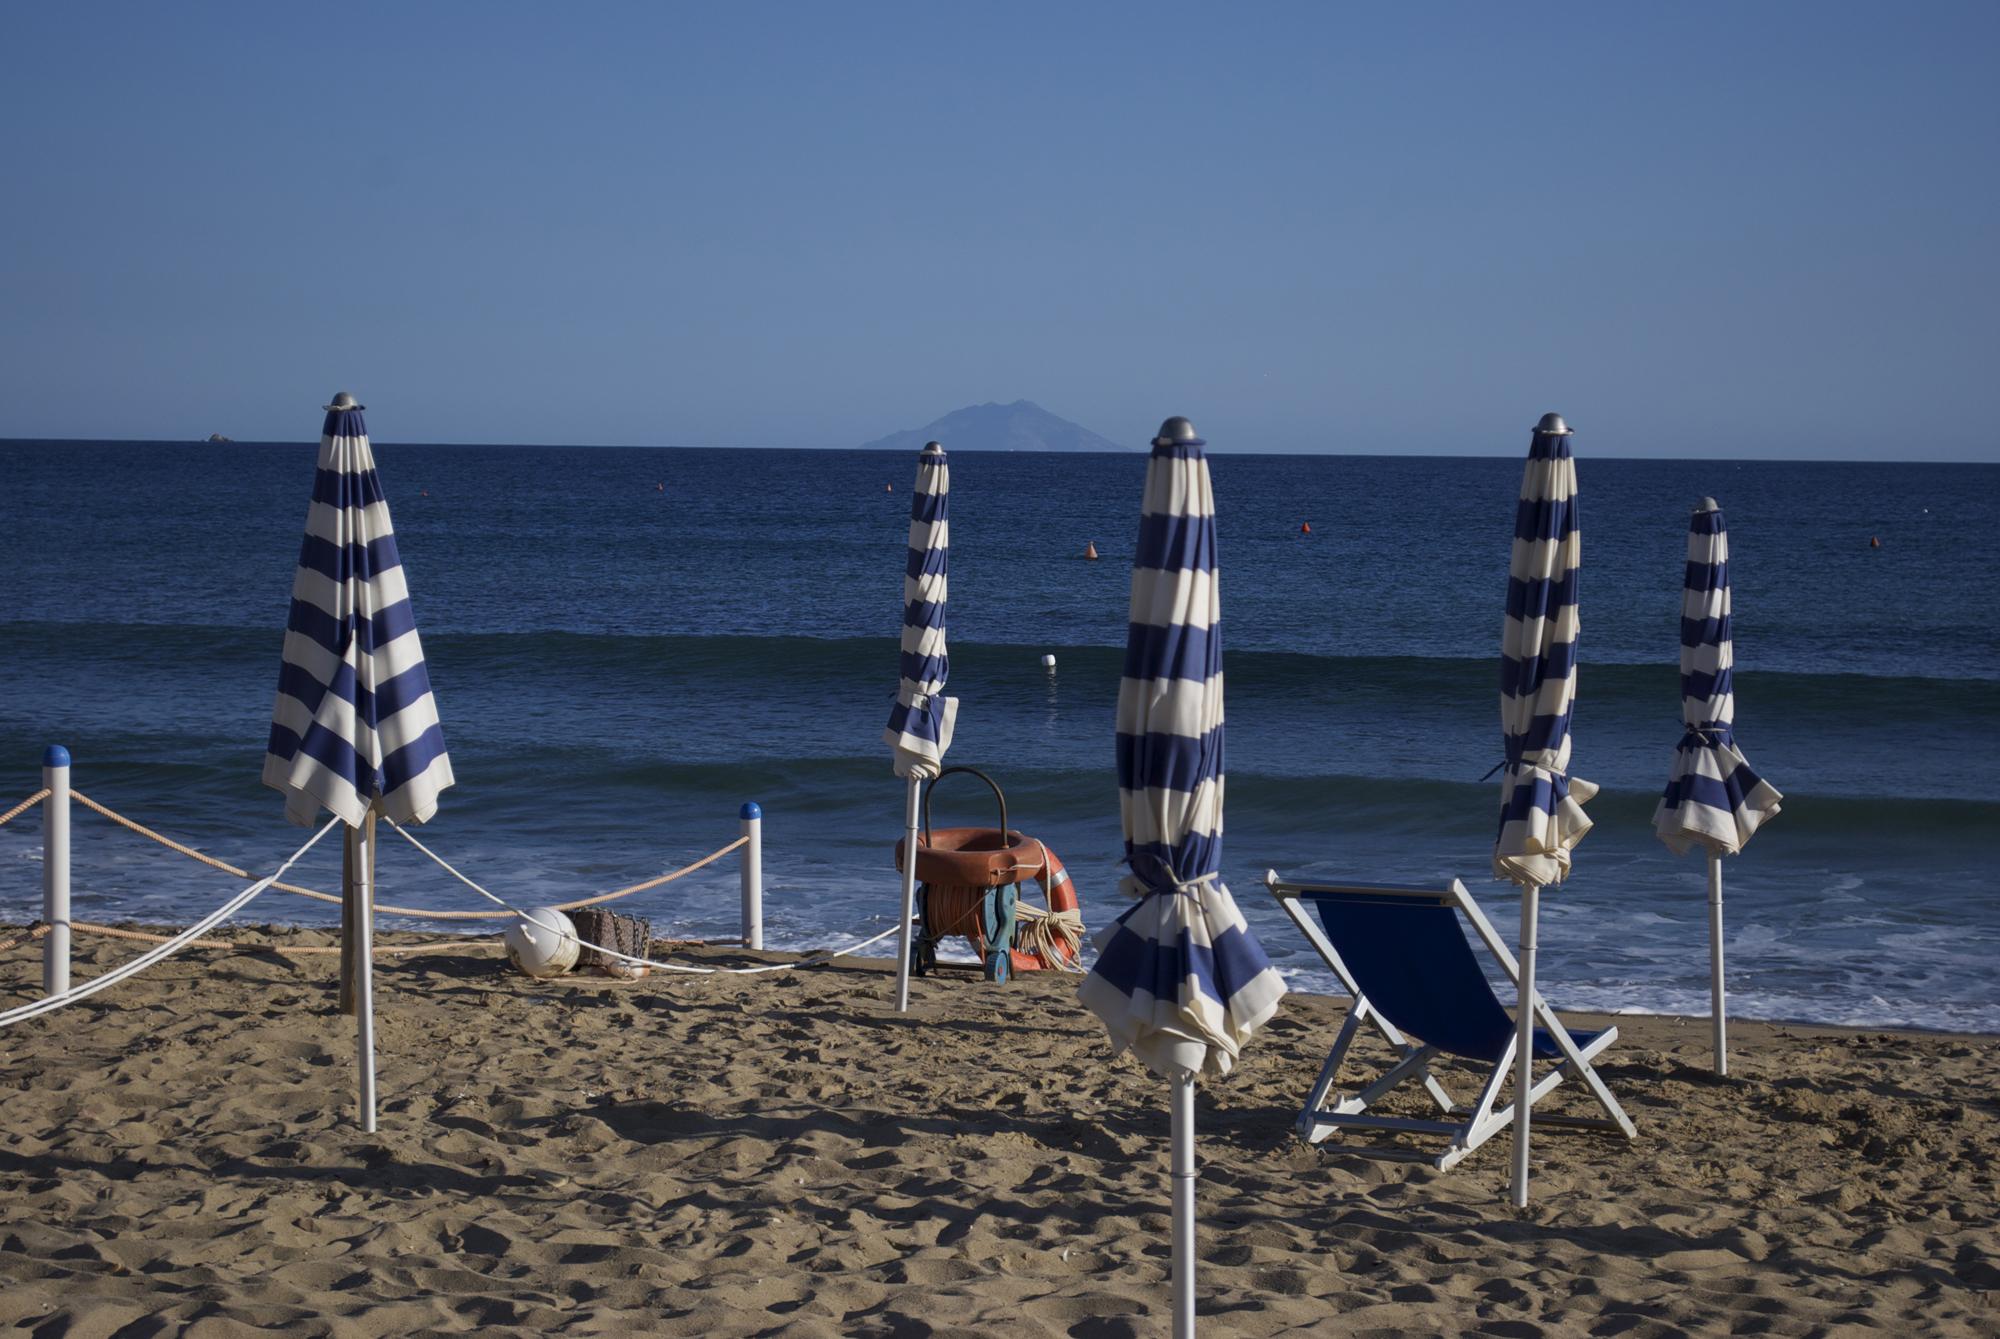 Spiaggia11.jpg